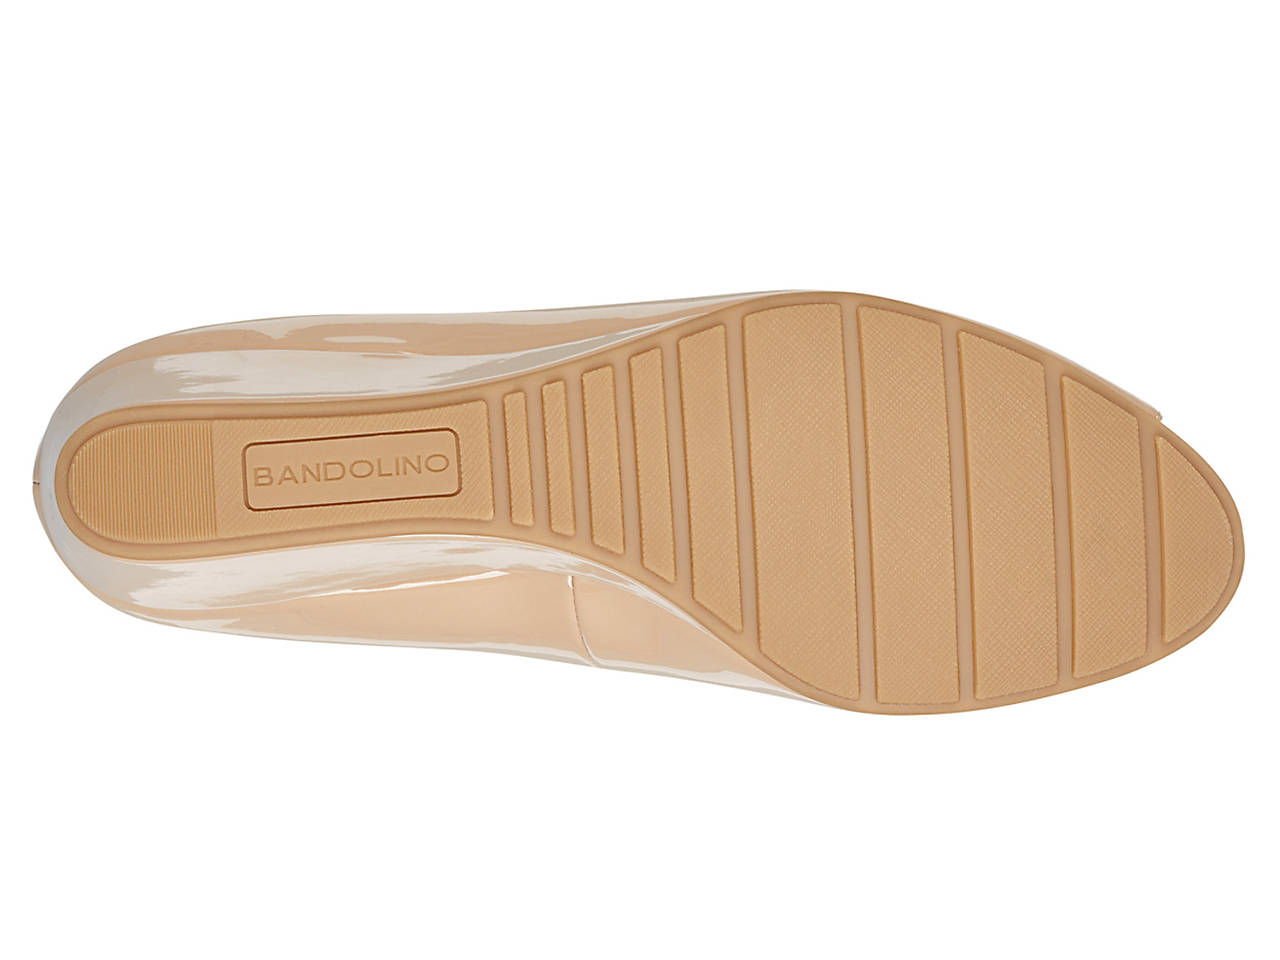 18451bef57dd Bandolino Candra Wedge Pump Women s Shoes